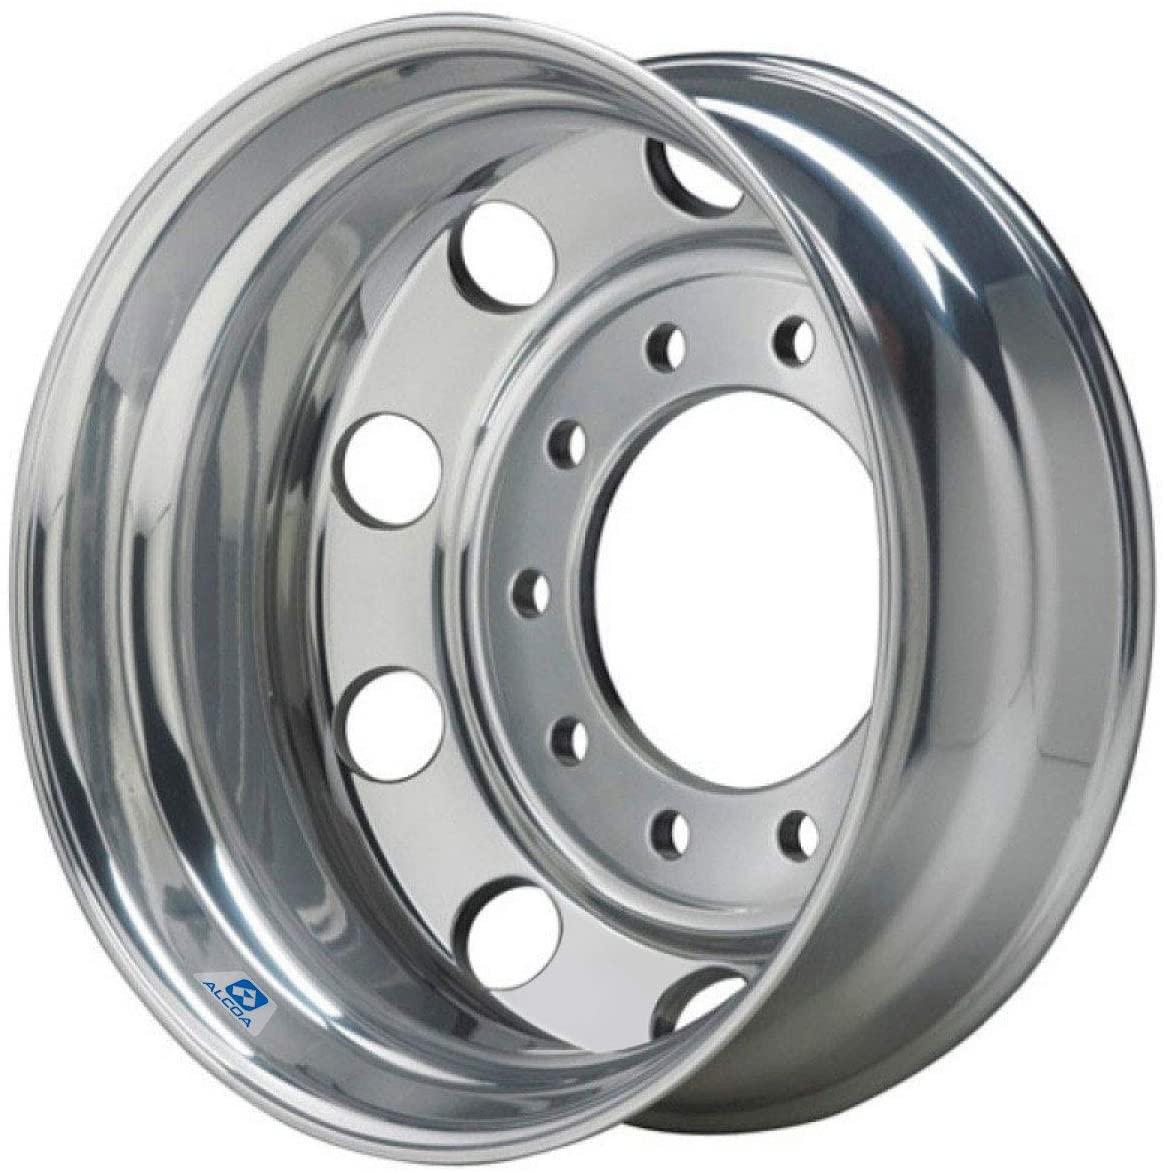 22.5x9 Polished Aluminum Drive/Trailer Wheel